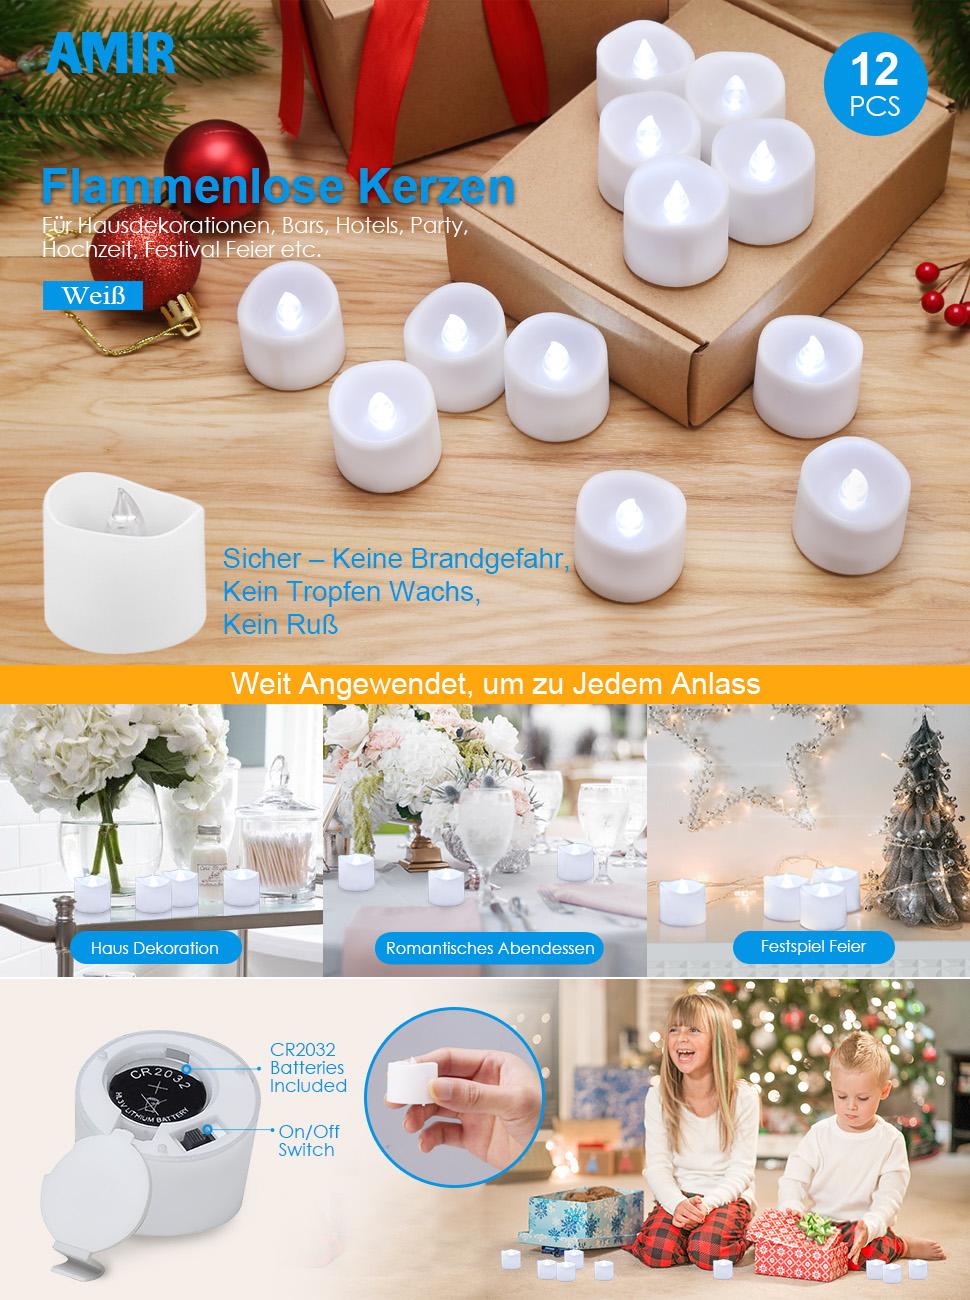 AMIR LED Kerzen, 12 LED Flammenlose Kerzen, Weihnachten LED ...